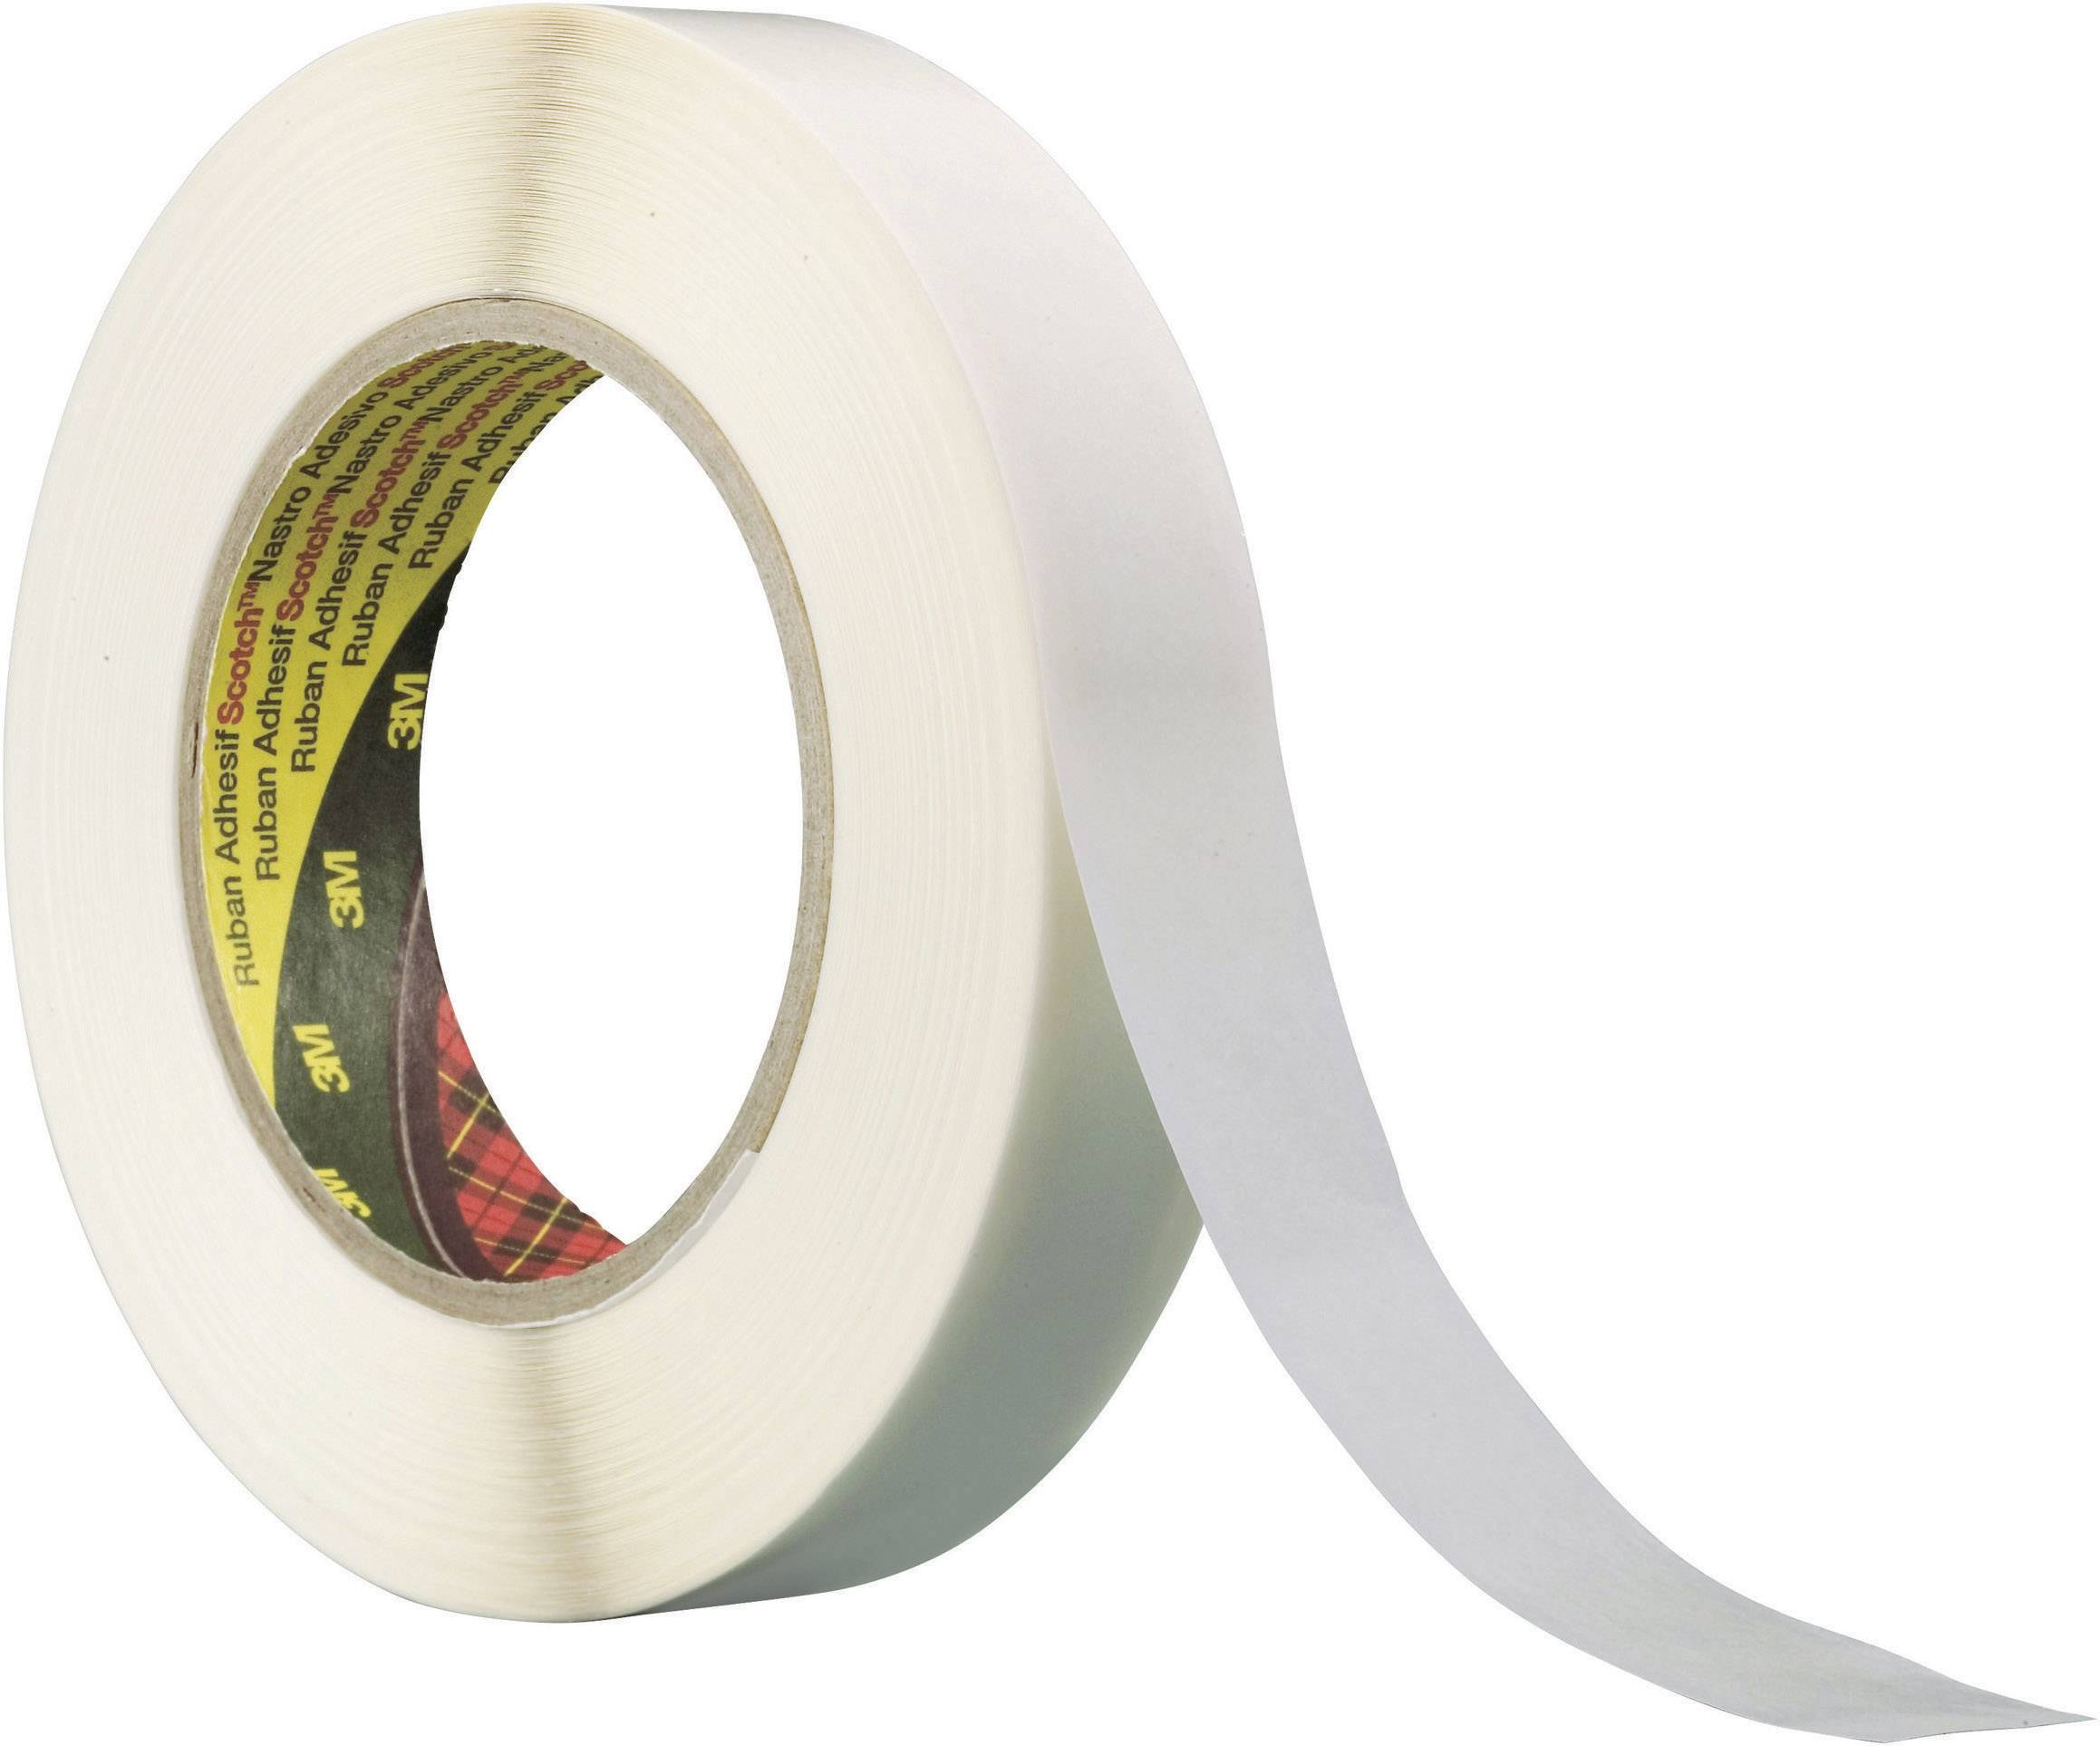 Obojstranná lepiaca páska 3M 983XL XT-0034-9252-4, (d x š) 50 m x 19 mm, krémová, 1 roliek